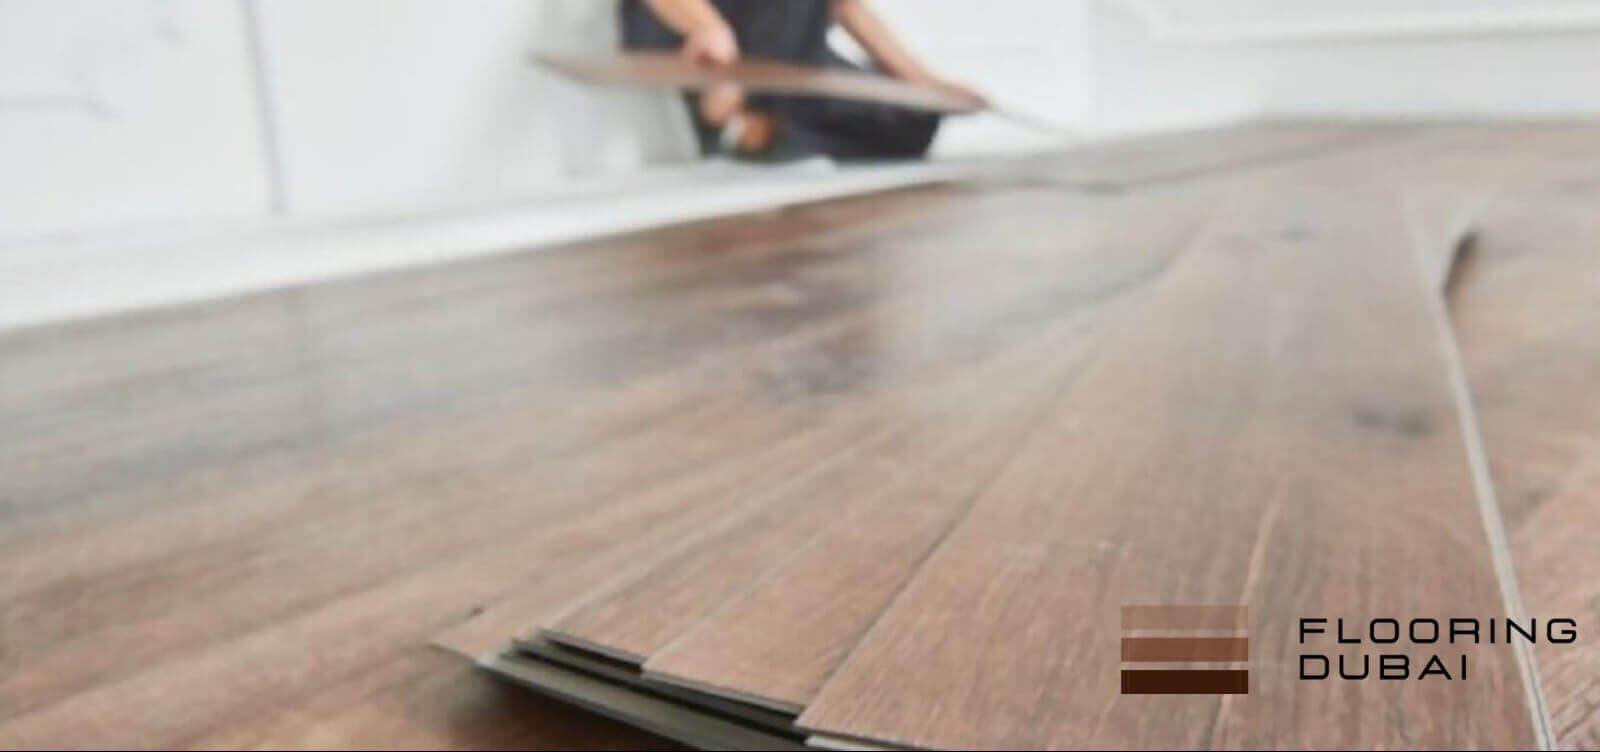 Flooring Dubai Slide2